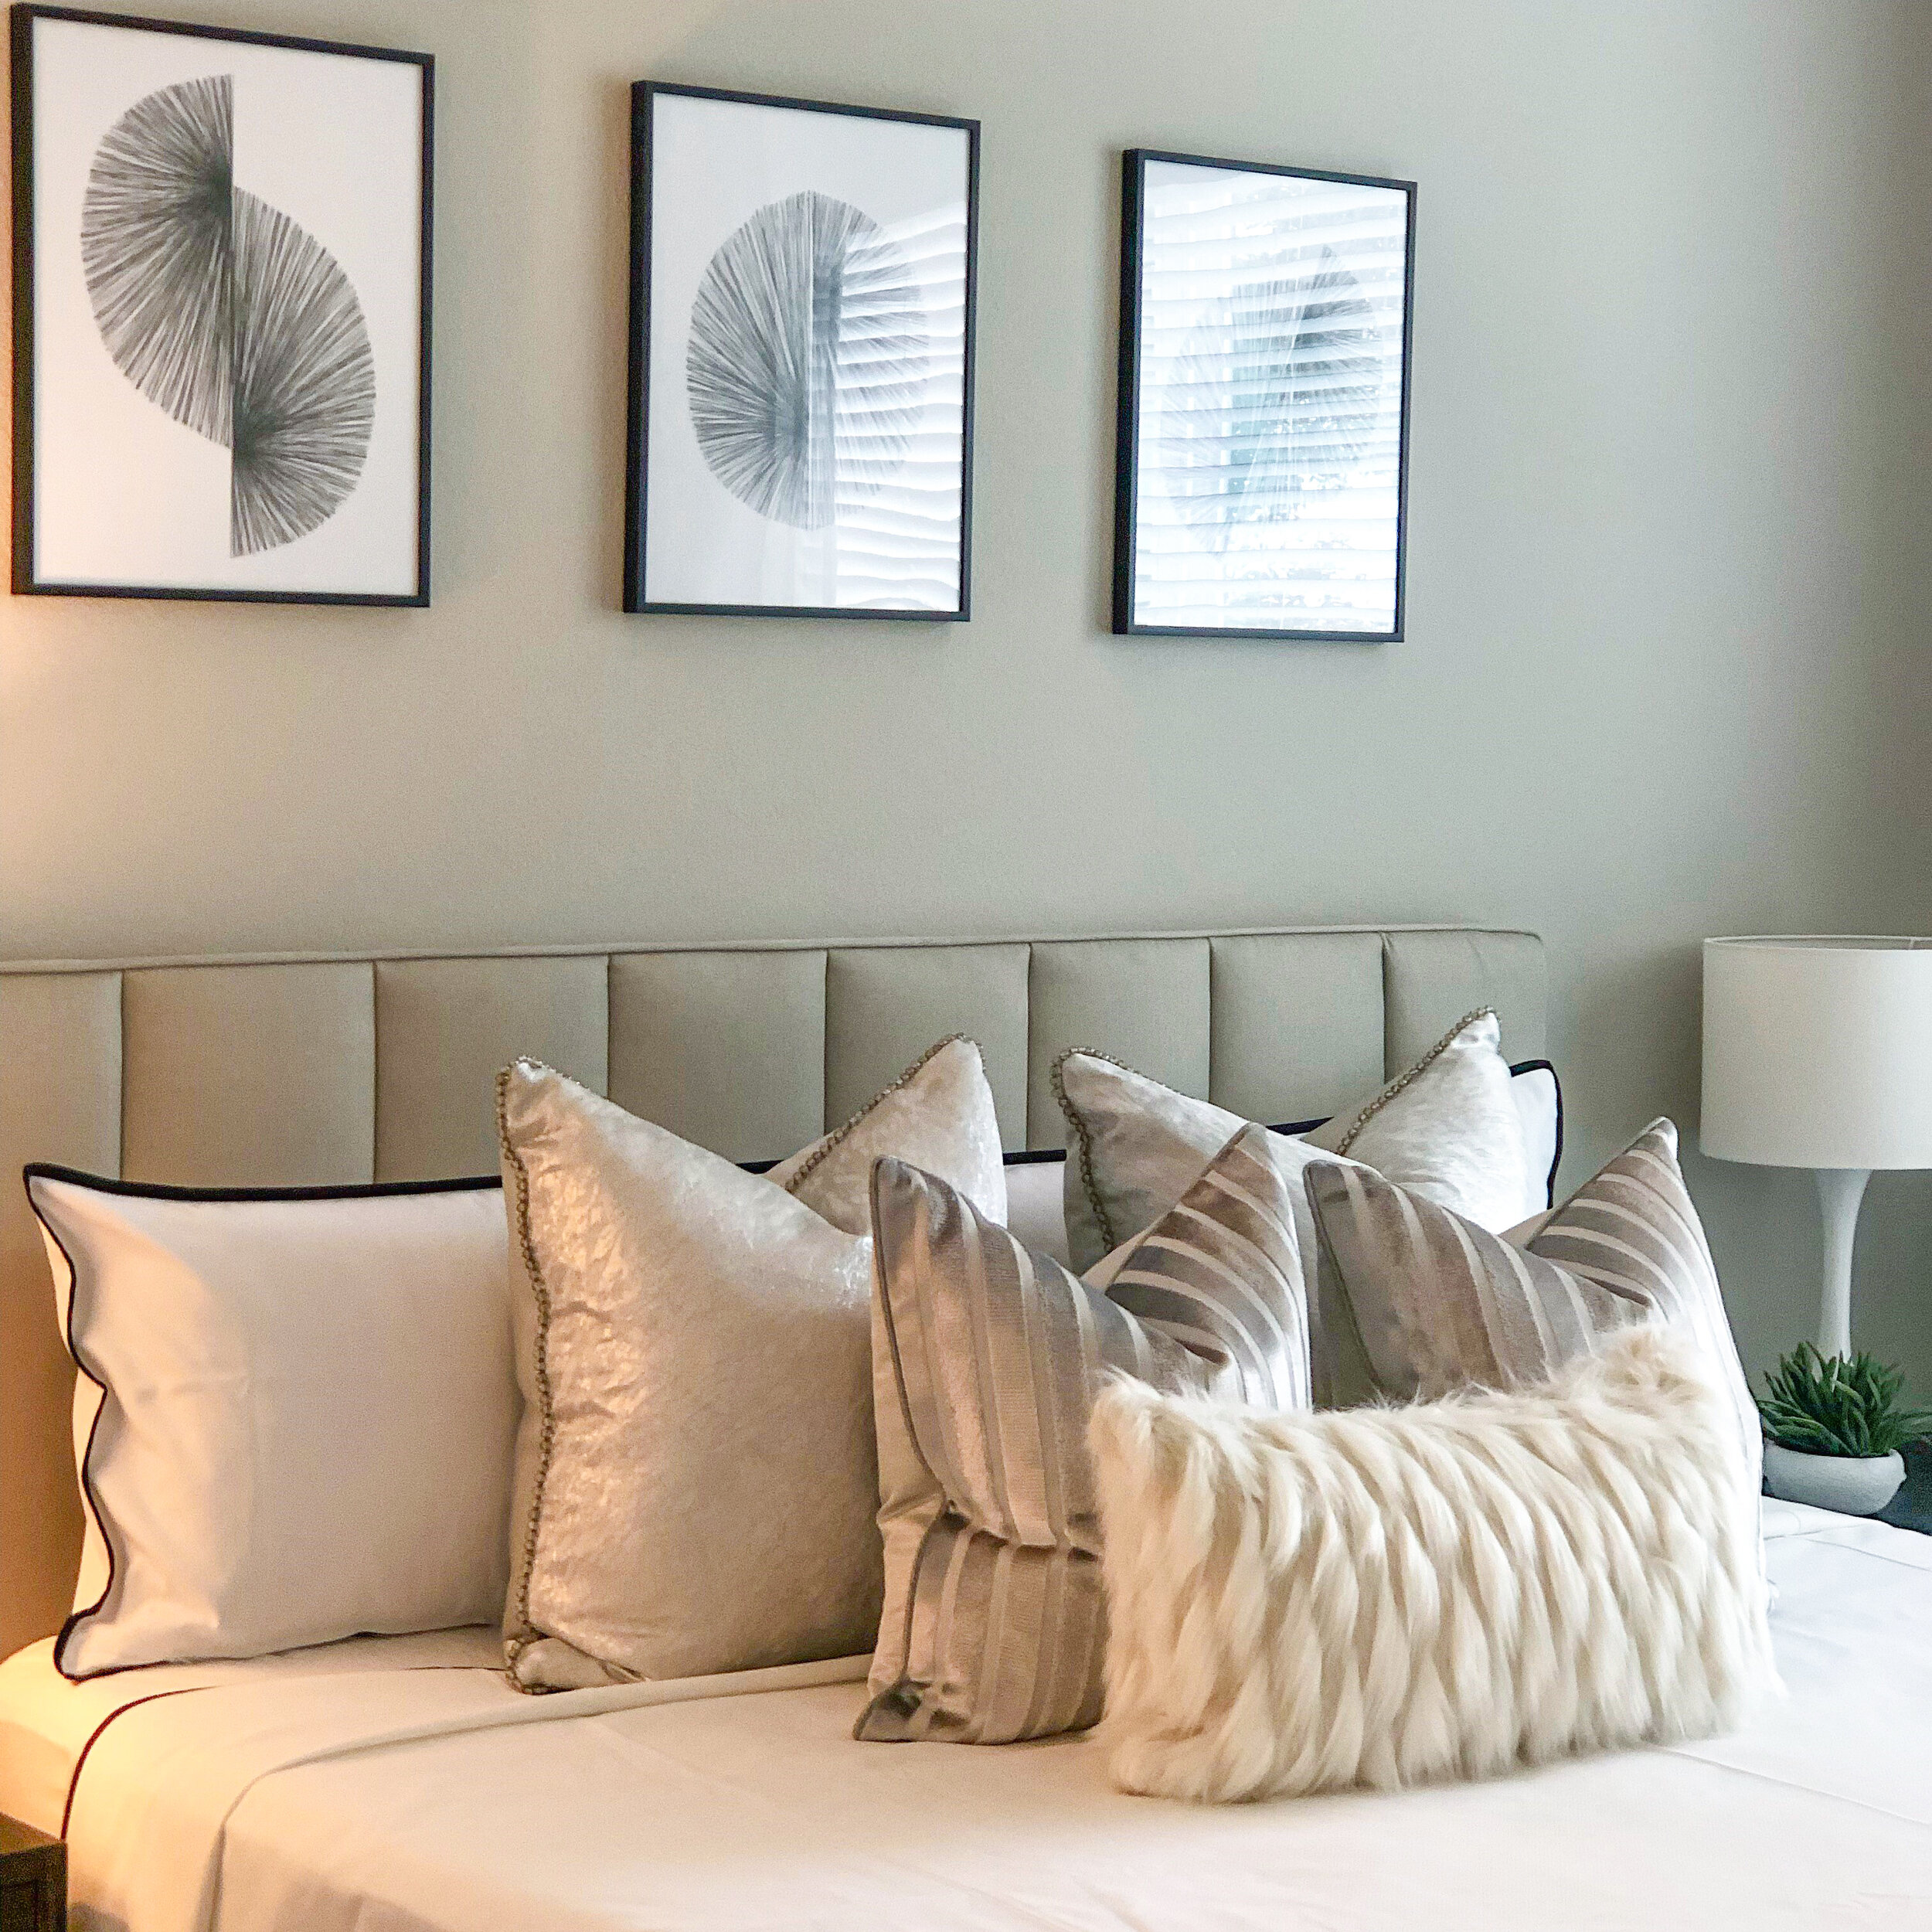 A Mid Century Apartment Design In Winter Park Fl Interior Design Winter Park Orlando Naples Beasley Henley